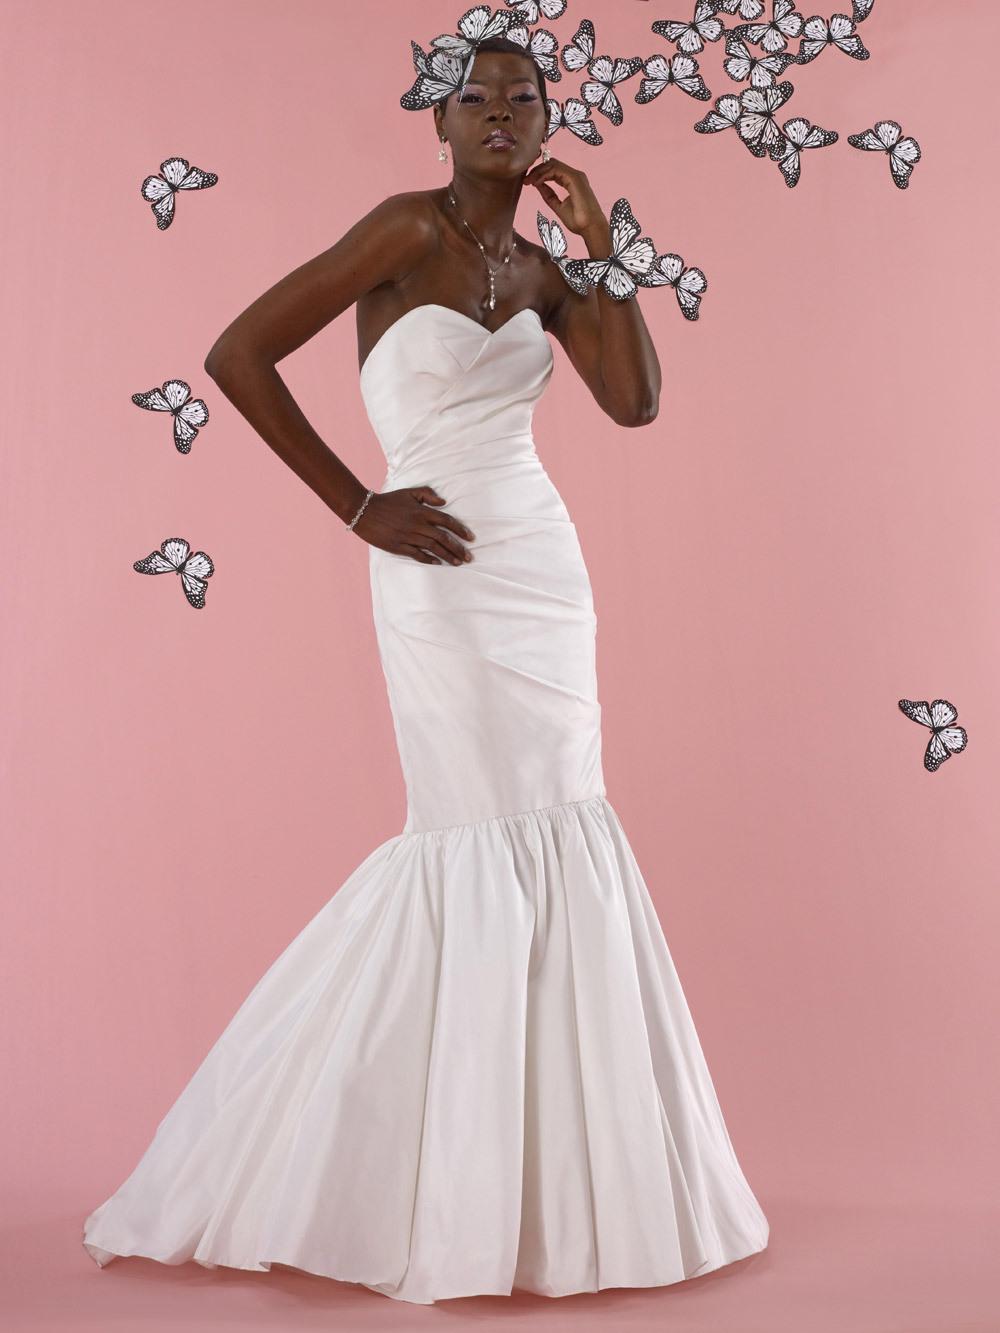 Vintage-inspired-wedding-dress-2012-bridal-gowns-steven-birnbaum-collection-crystal.full